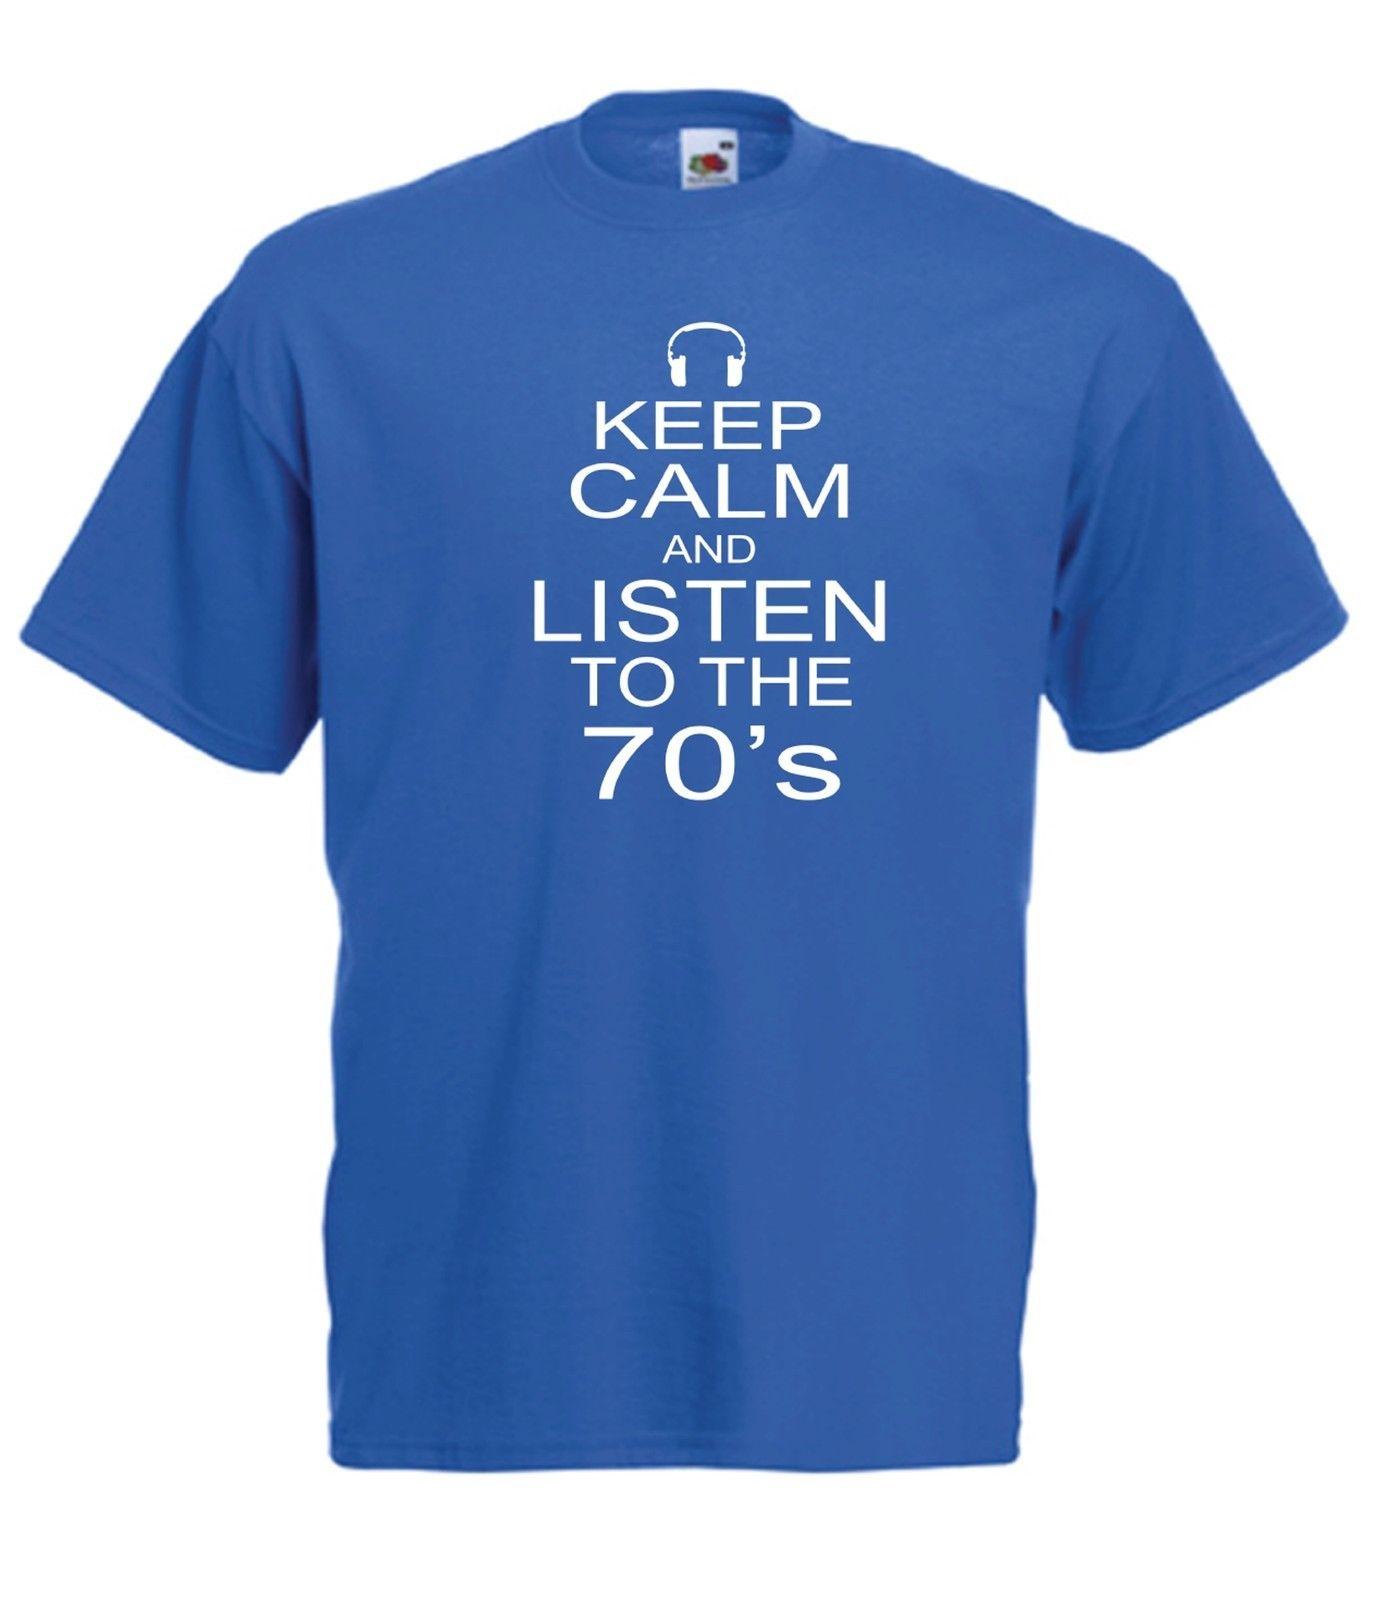 KEEP CALM 70S funny music party New Mens Womens T SHIRT TOP 8-16 s m l xl xxl Harajuku Tops Fashion Classic Unique